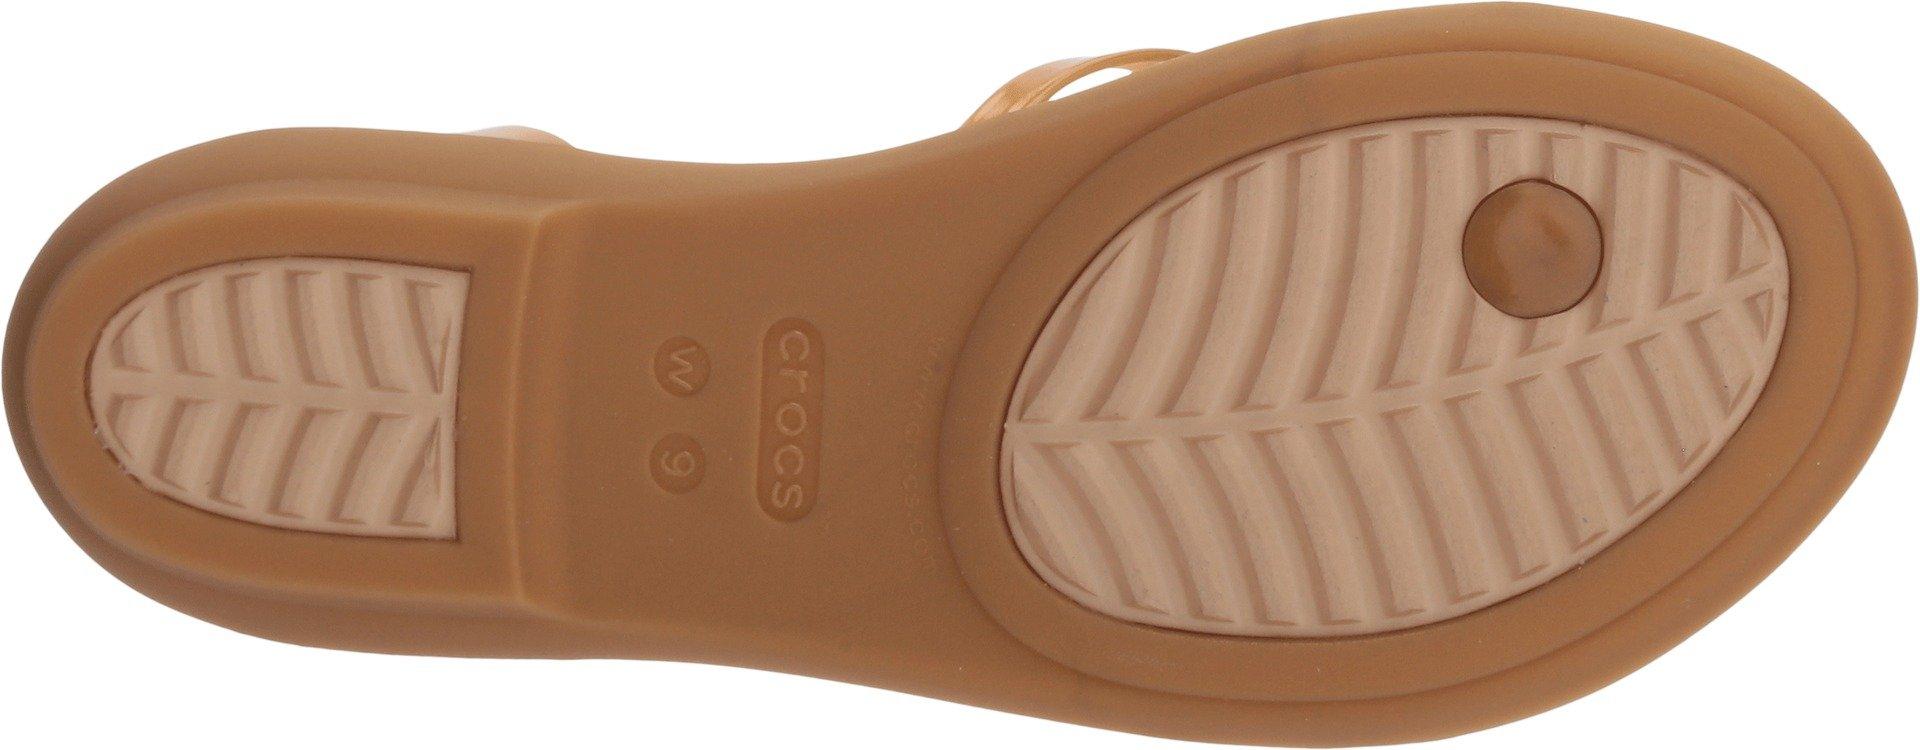 Crocs Women's Isabella Gladiator Sandal W Flat, Dark Gold, 6 M US by Crocs (Image #3)